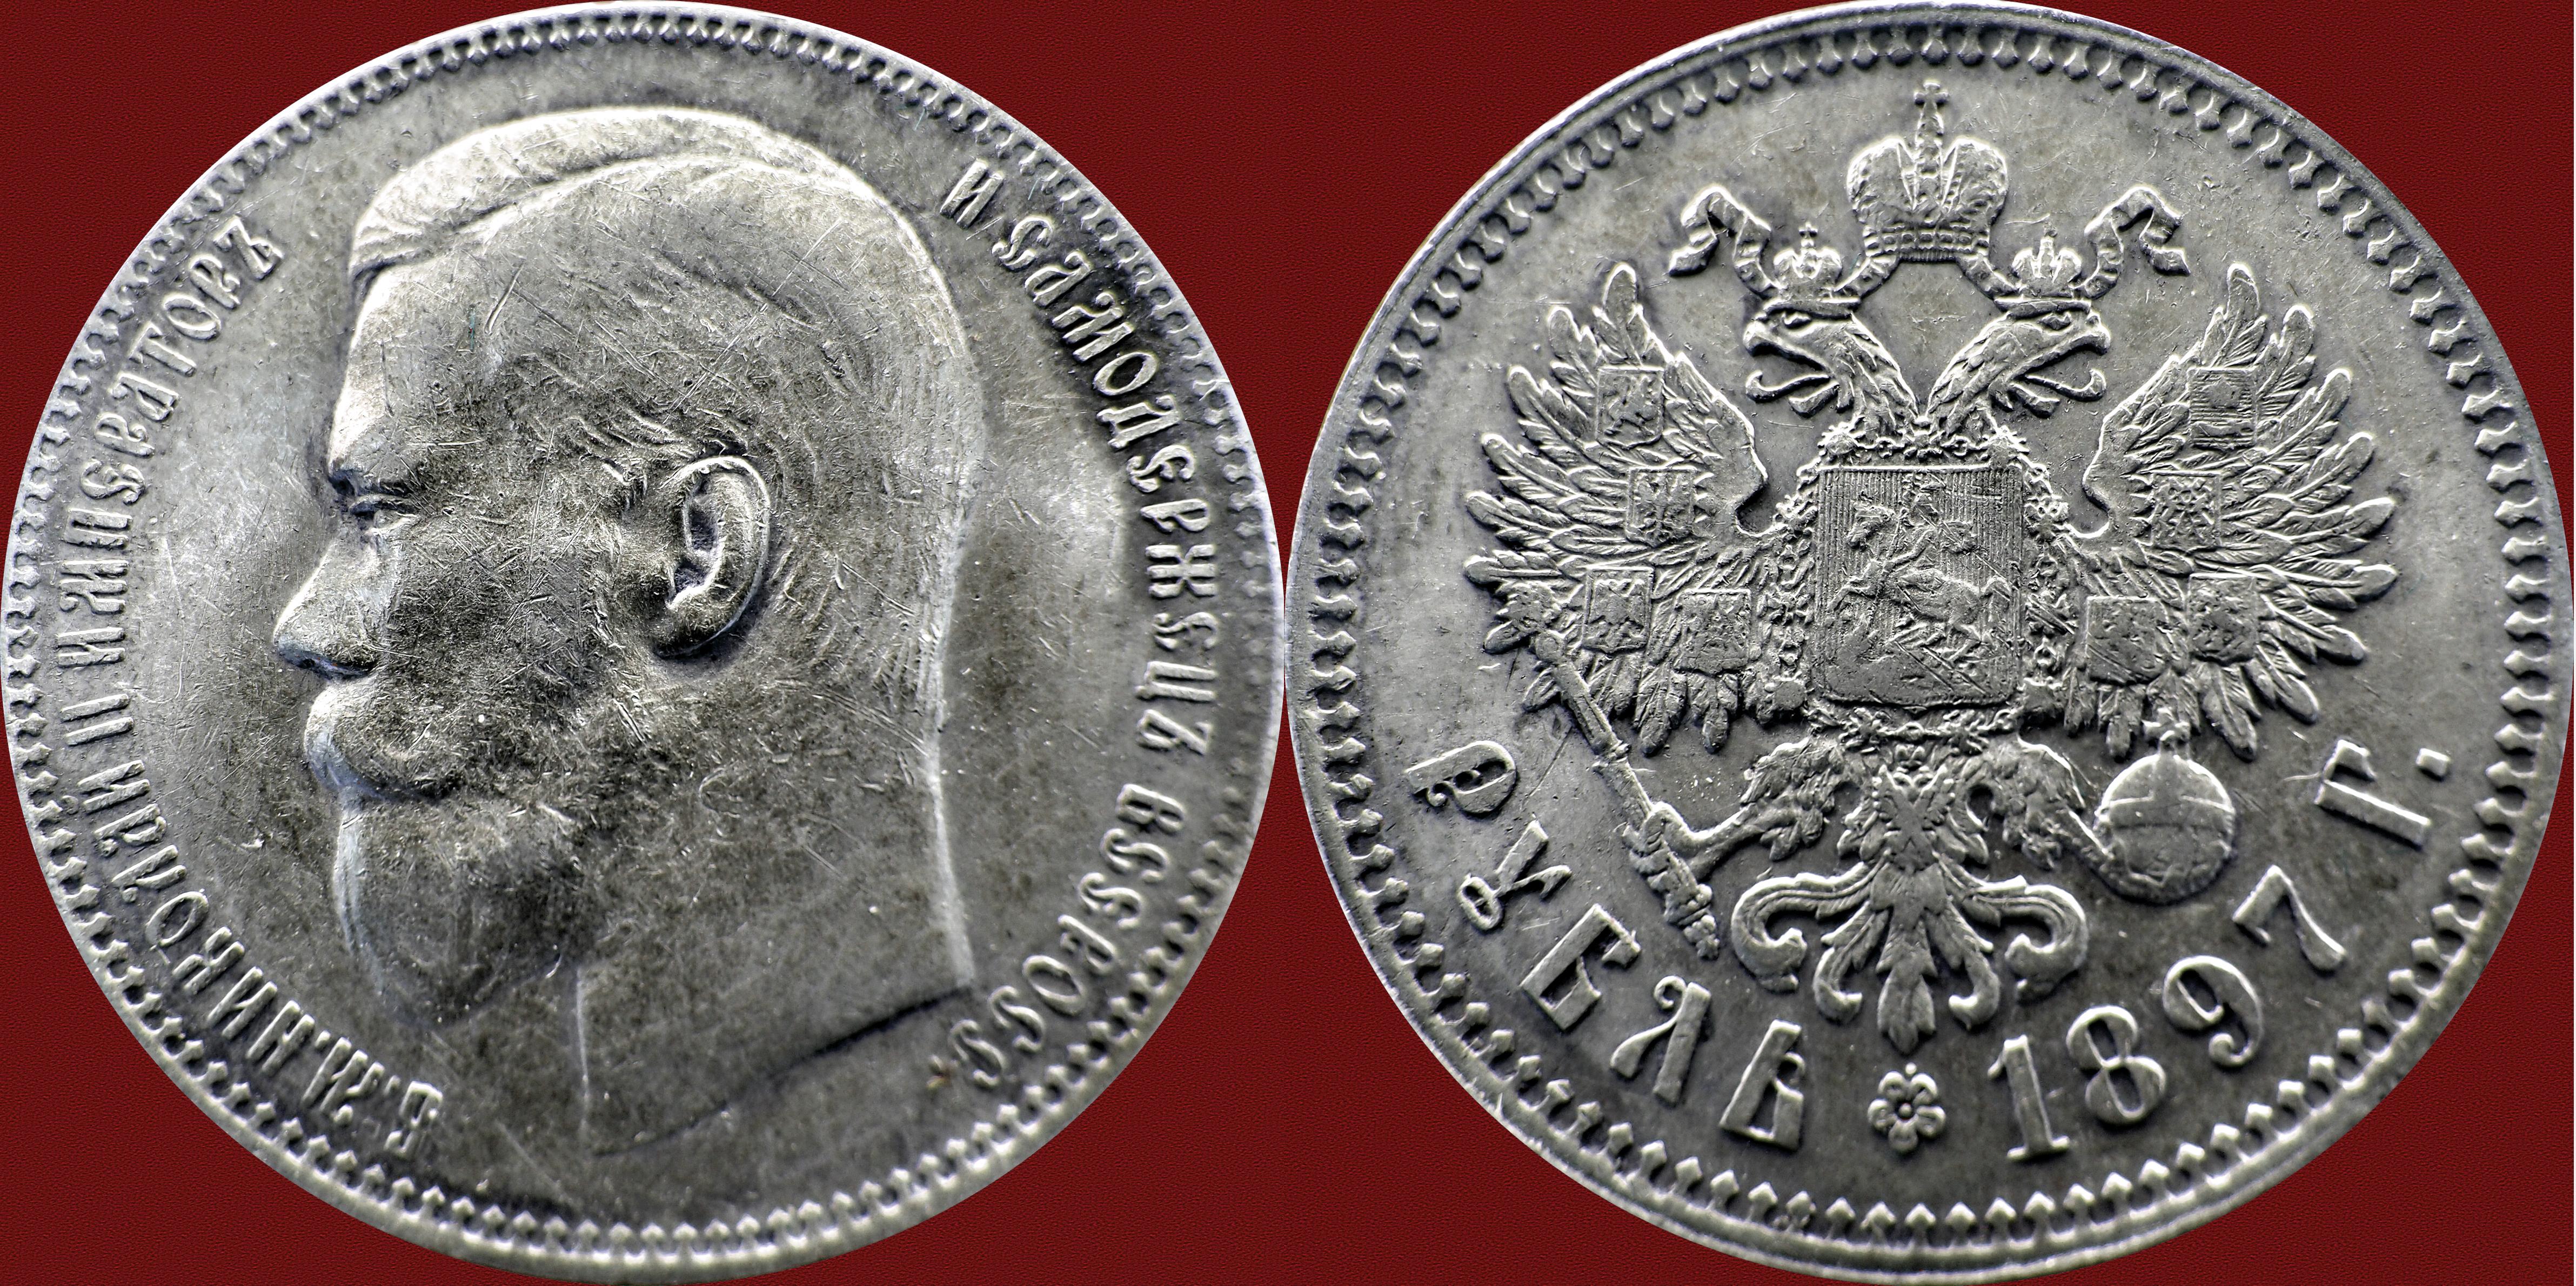 Rusia. 1 Rublo 1897. Nicolas II 12617769583_6ecac96804_o